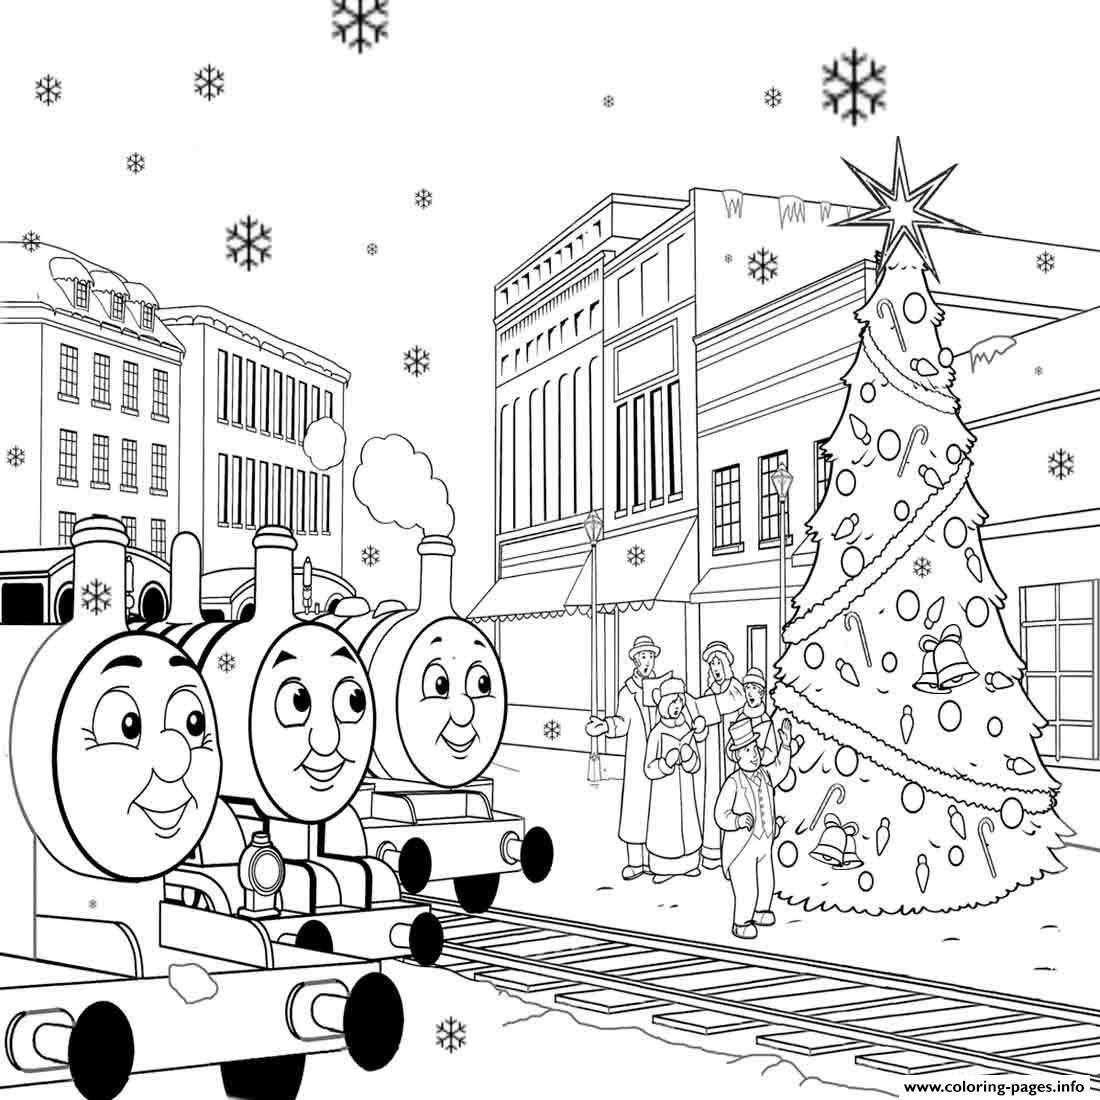 Free Printable Thomas The Train S For Kids Christmasa2de Coloring ...